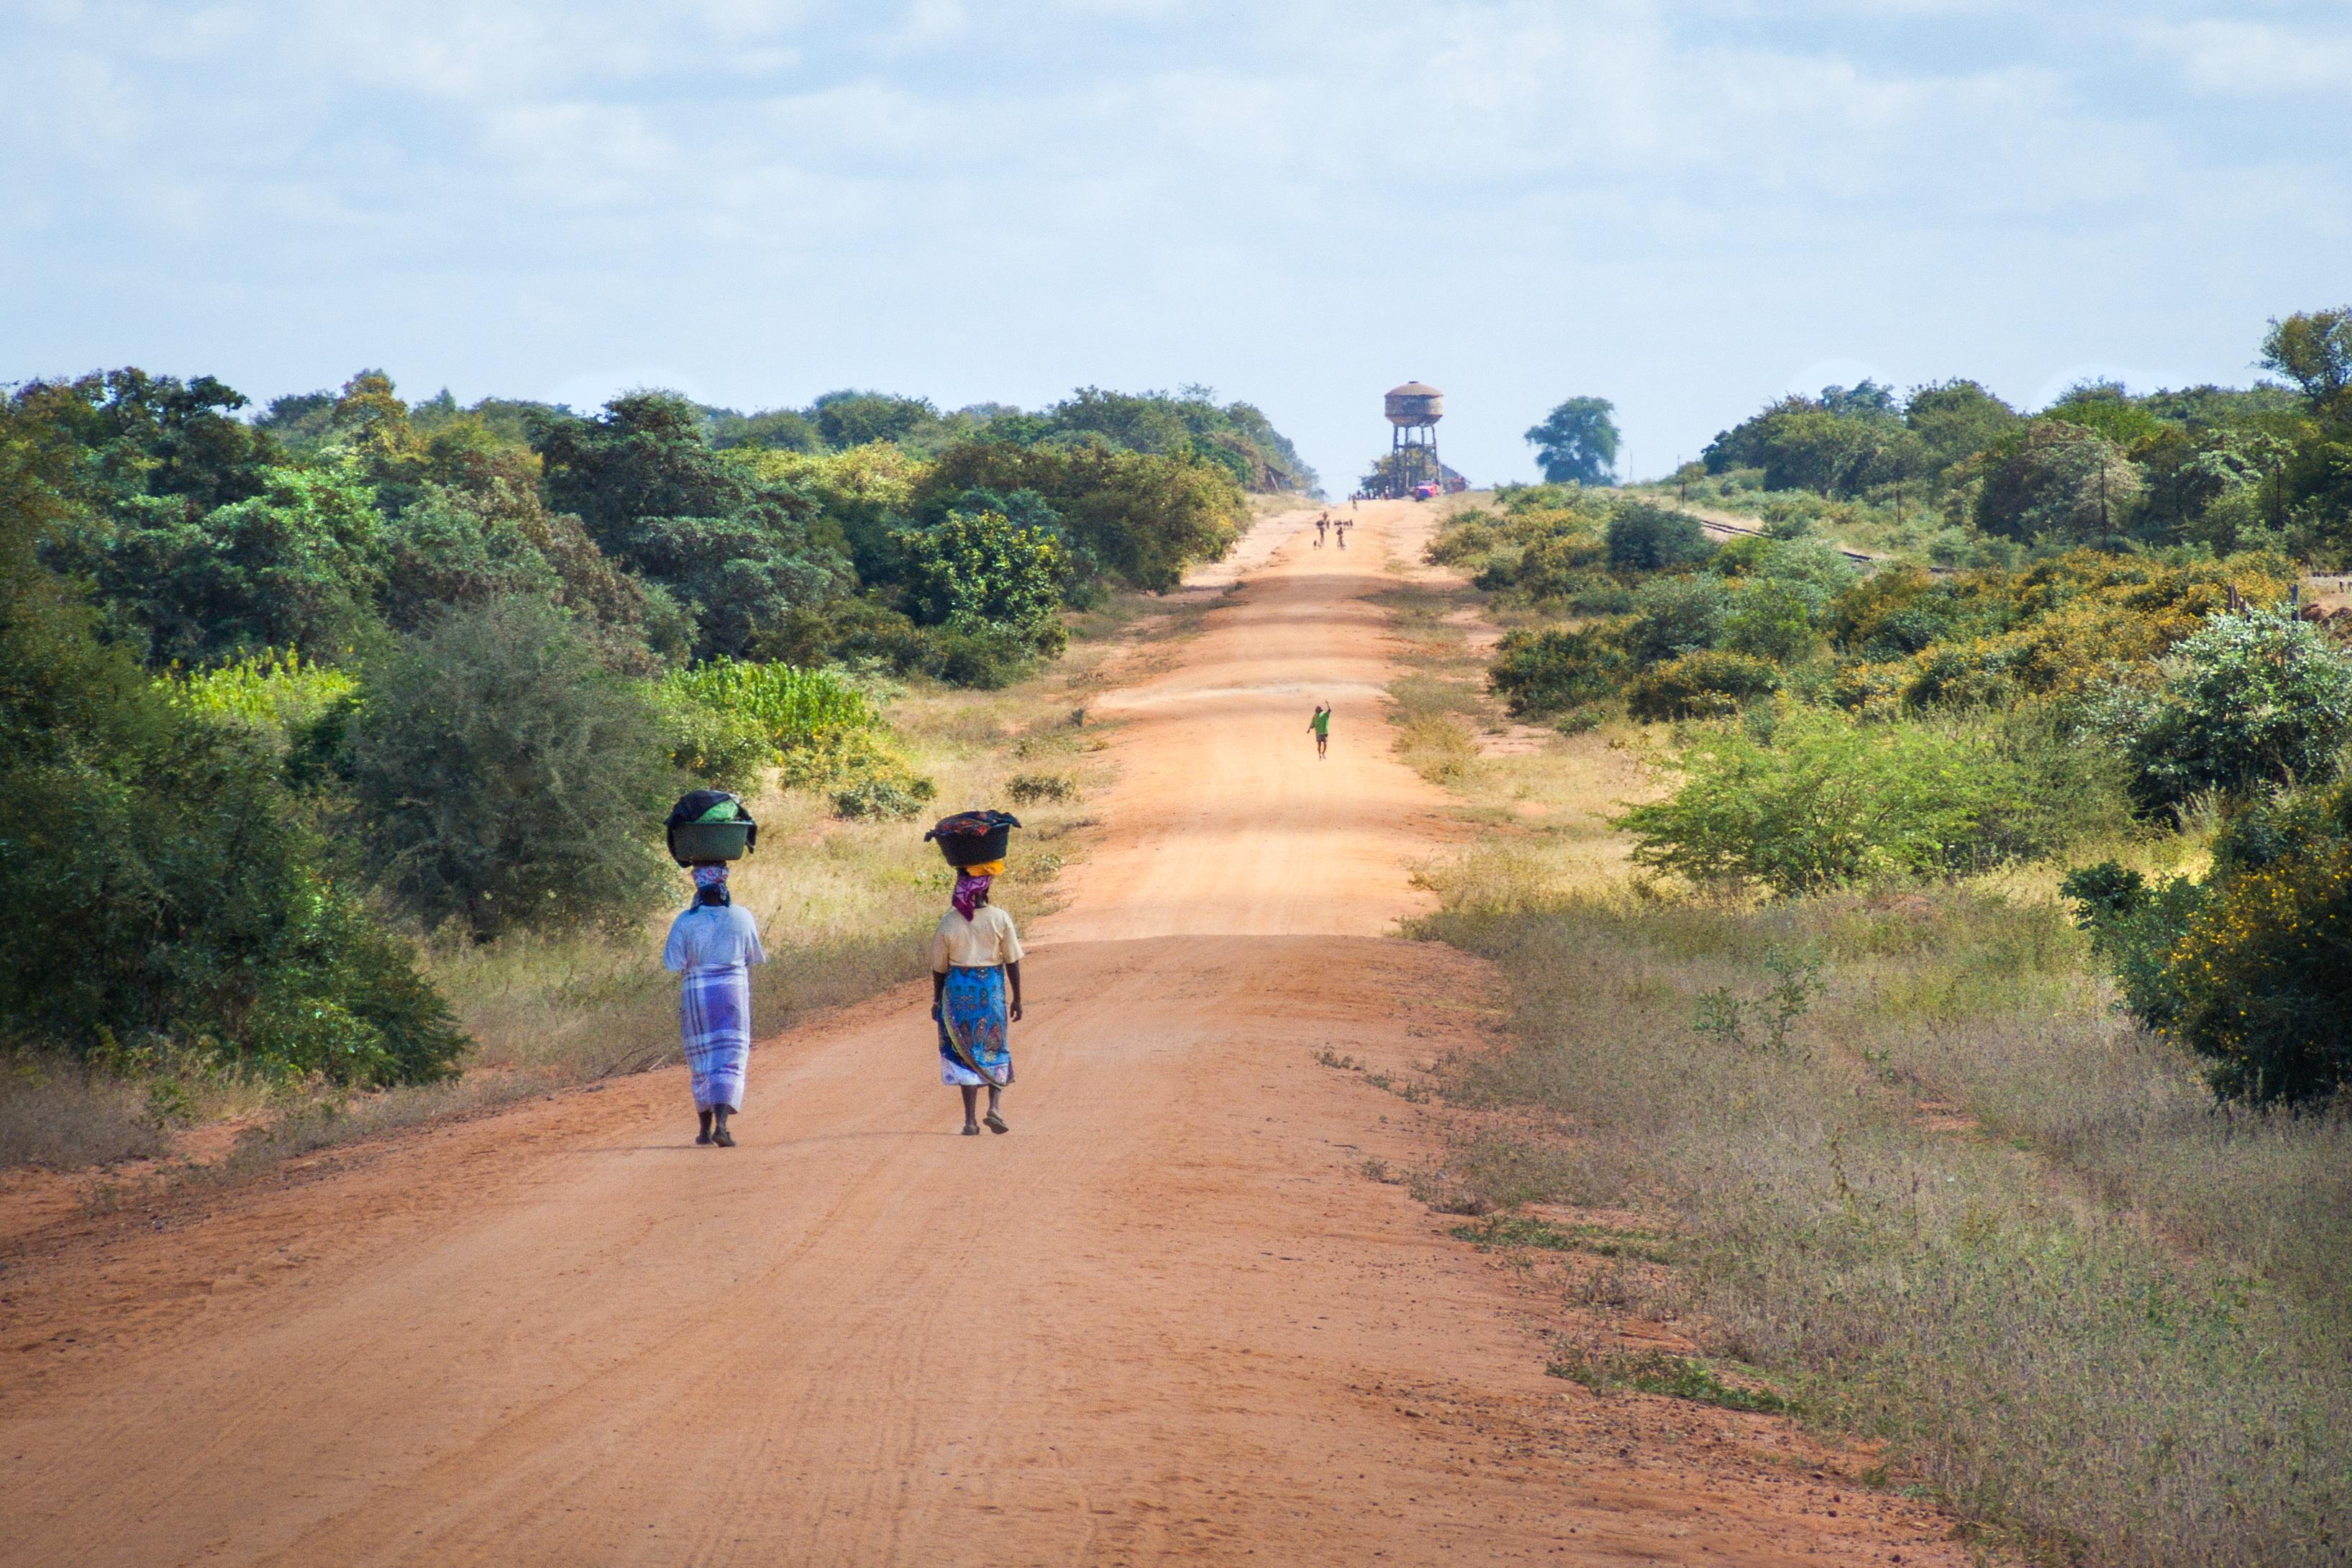 https://pixabay.com/photos/african-women-walking-along-road-2983081/